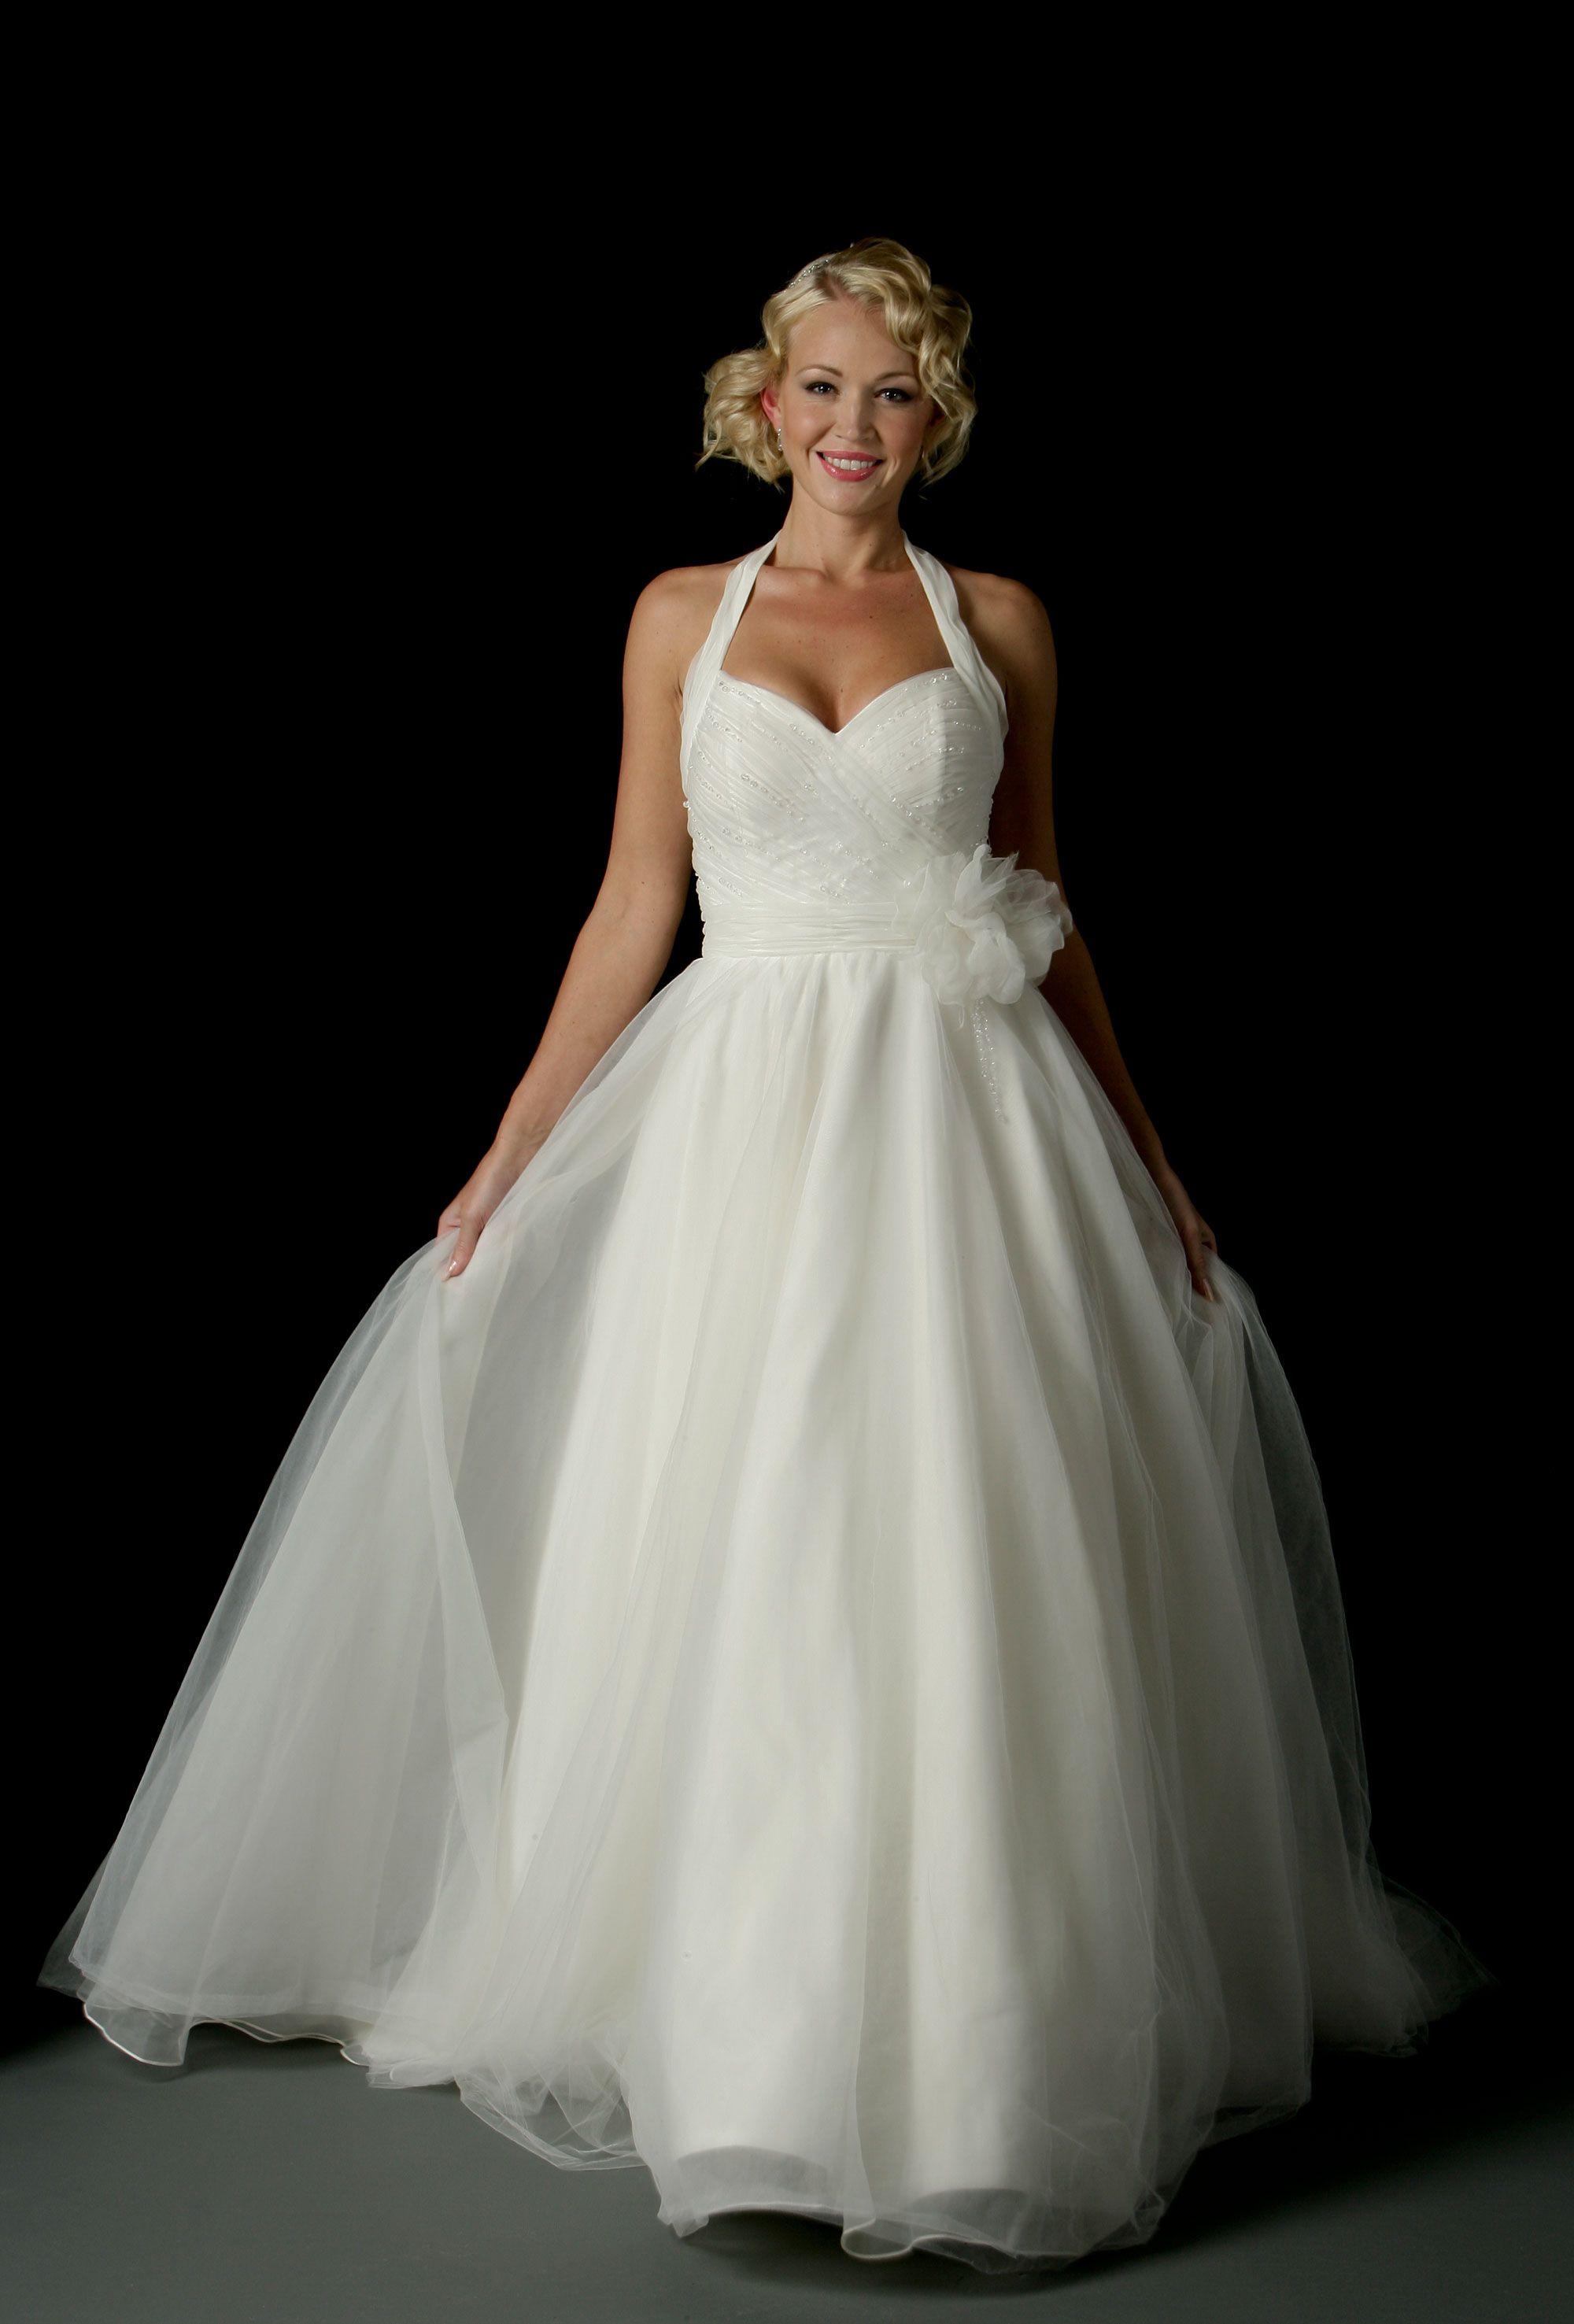 50s style wedding dress uk Halter top wedding dress